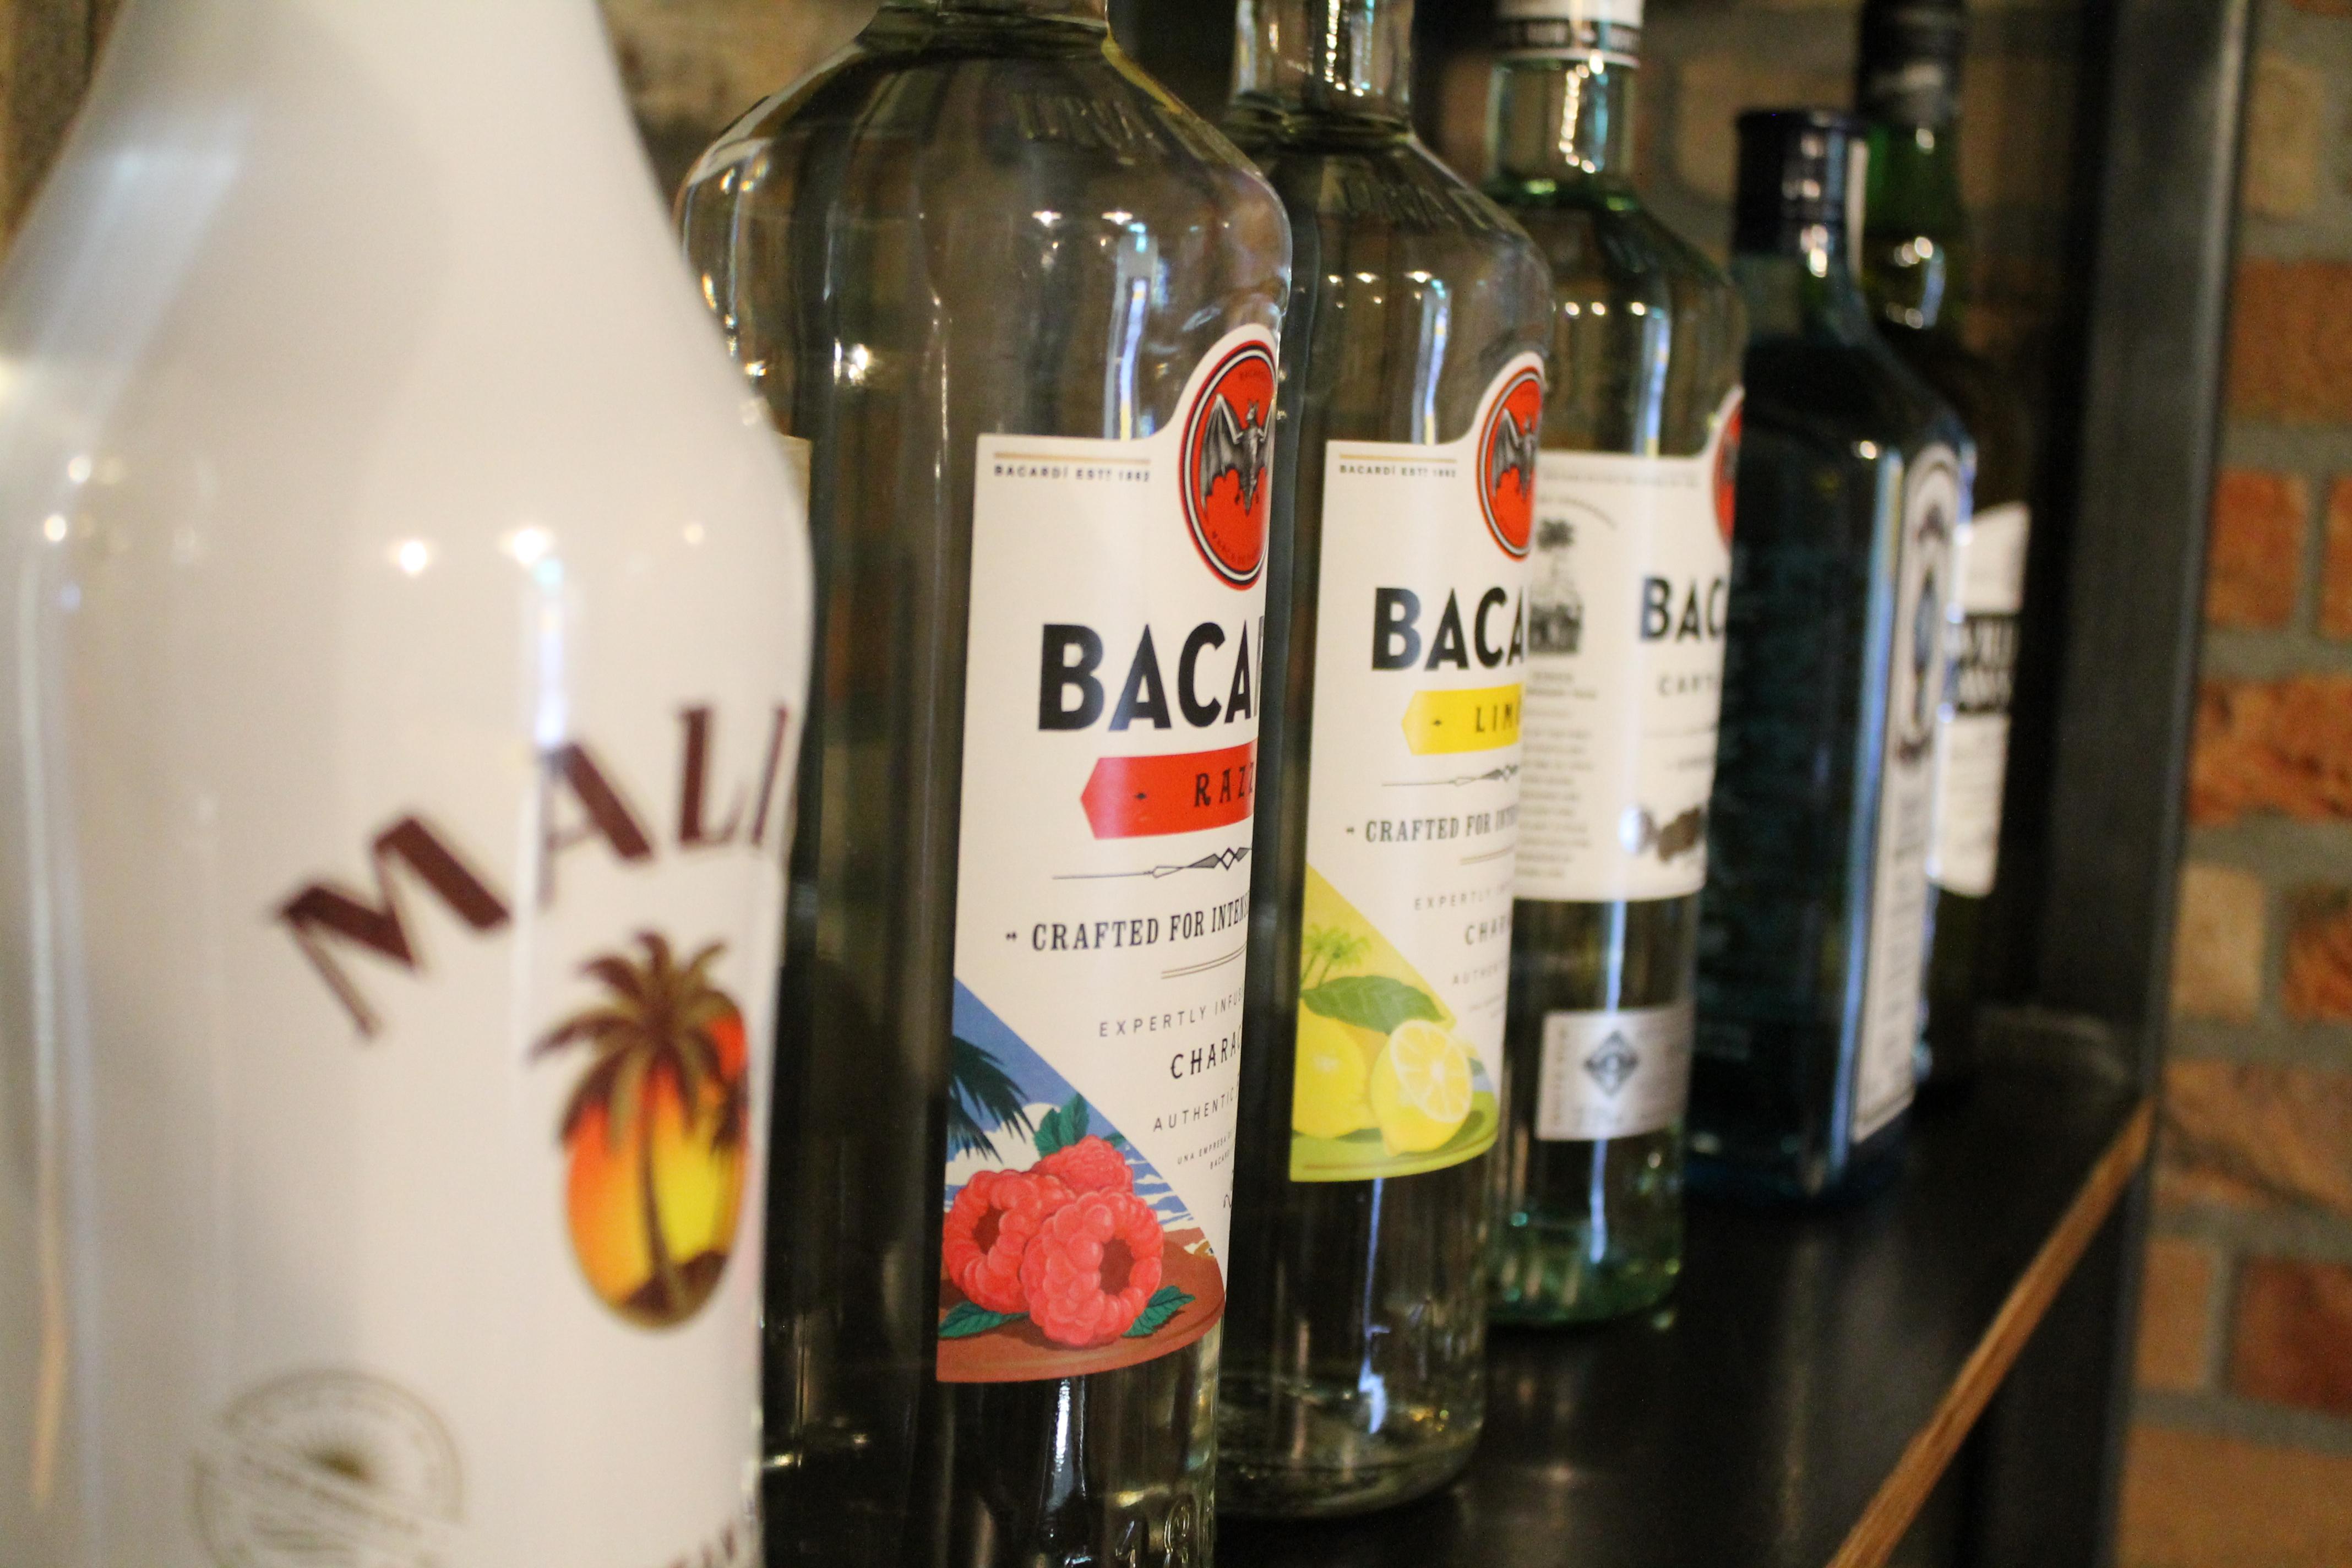 Bacardi bij Café Lalalaa in Den Bosch